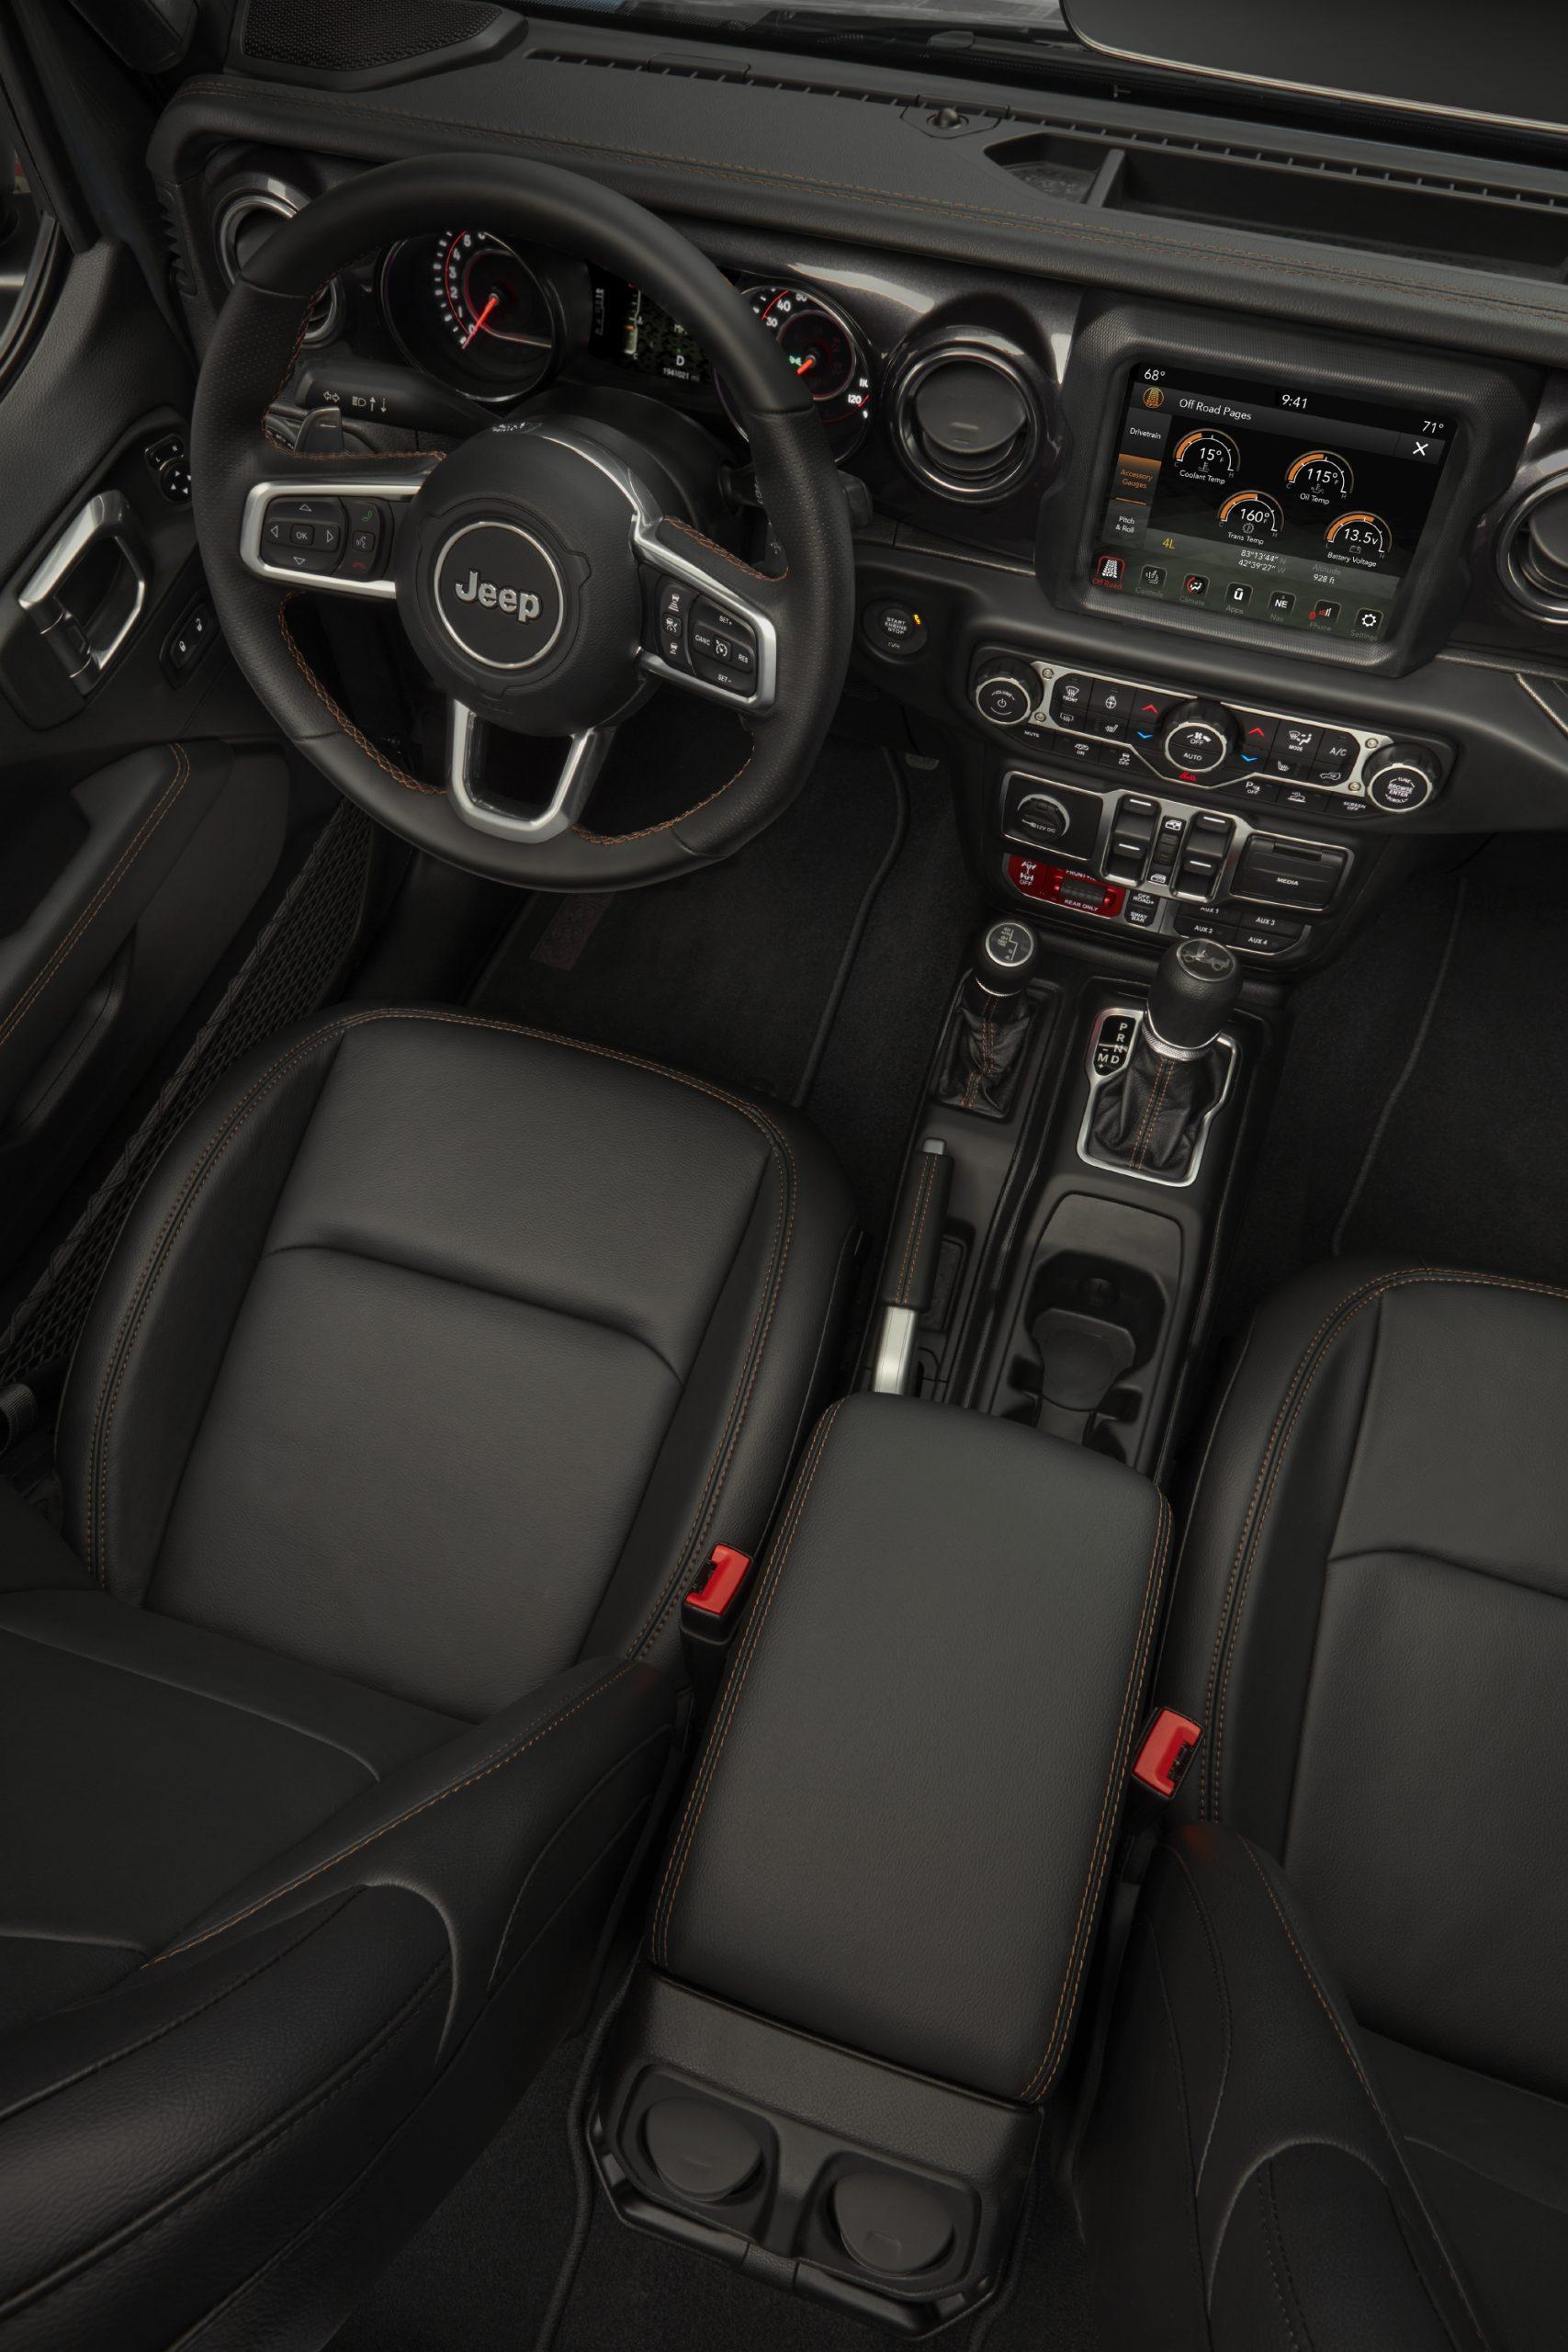 2021 Jeep Wrangler Rubicon 392 interior overhead